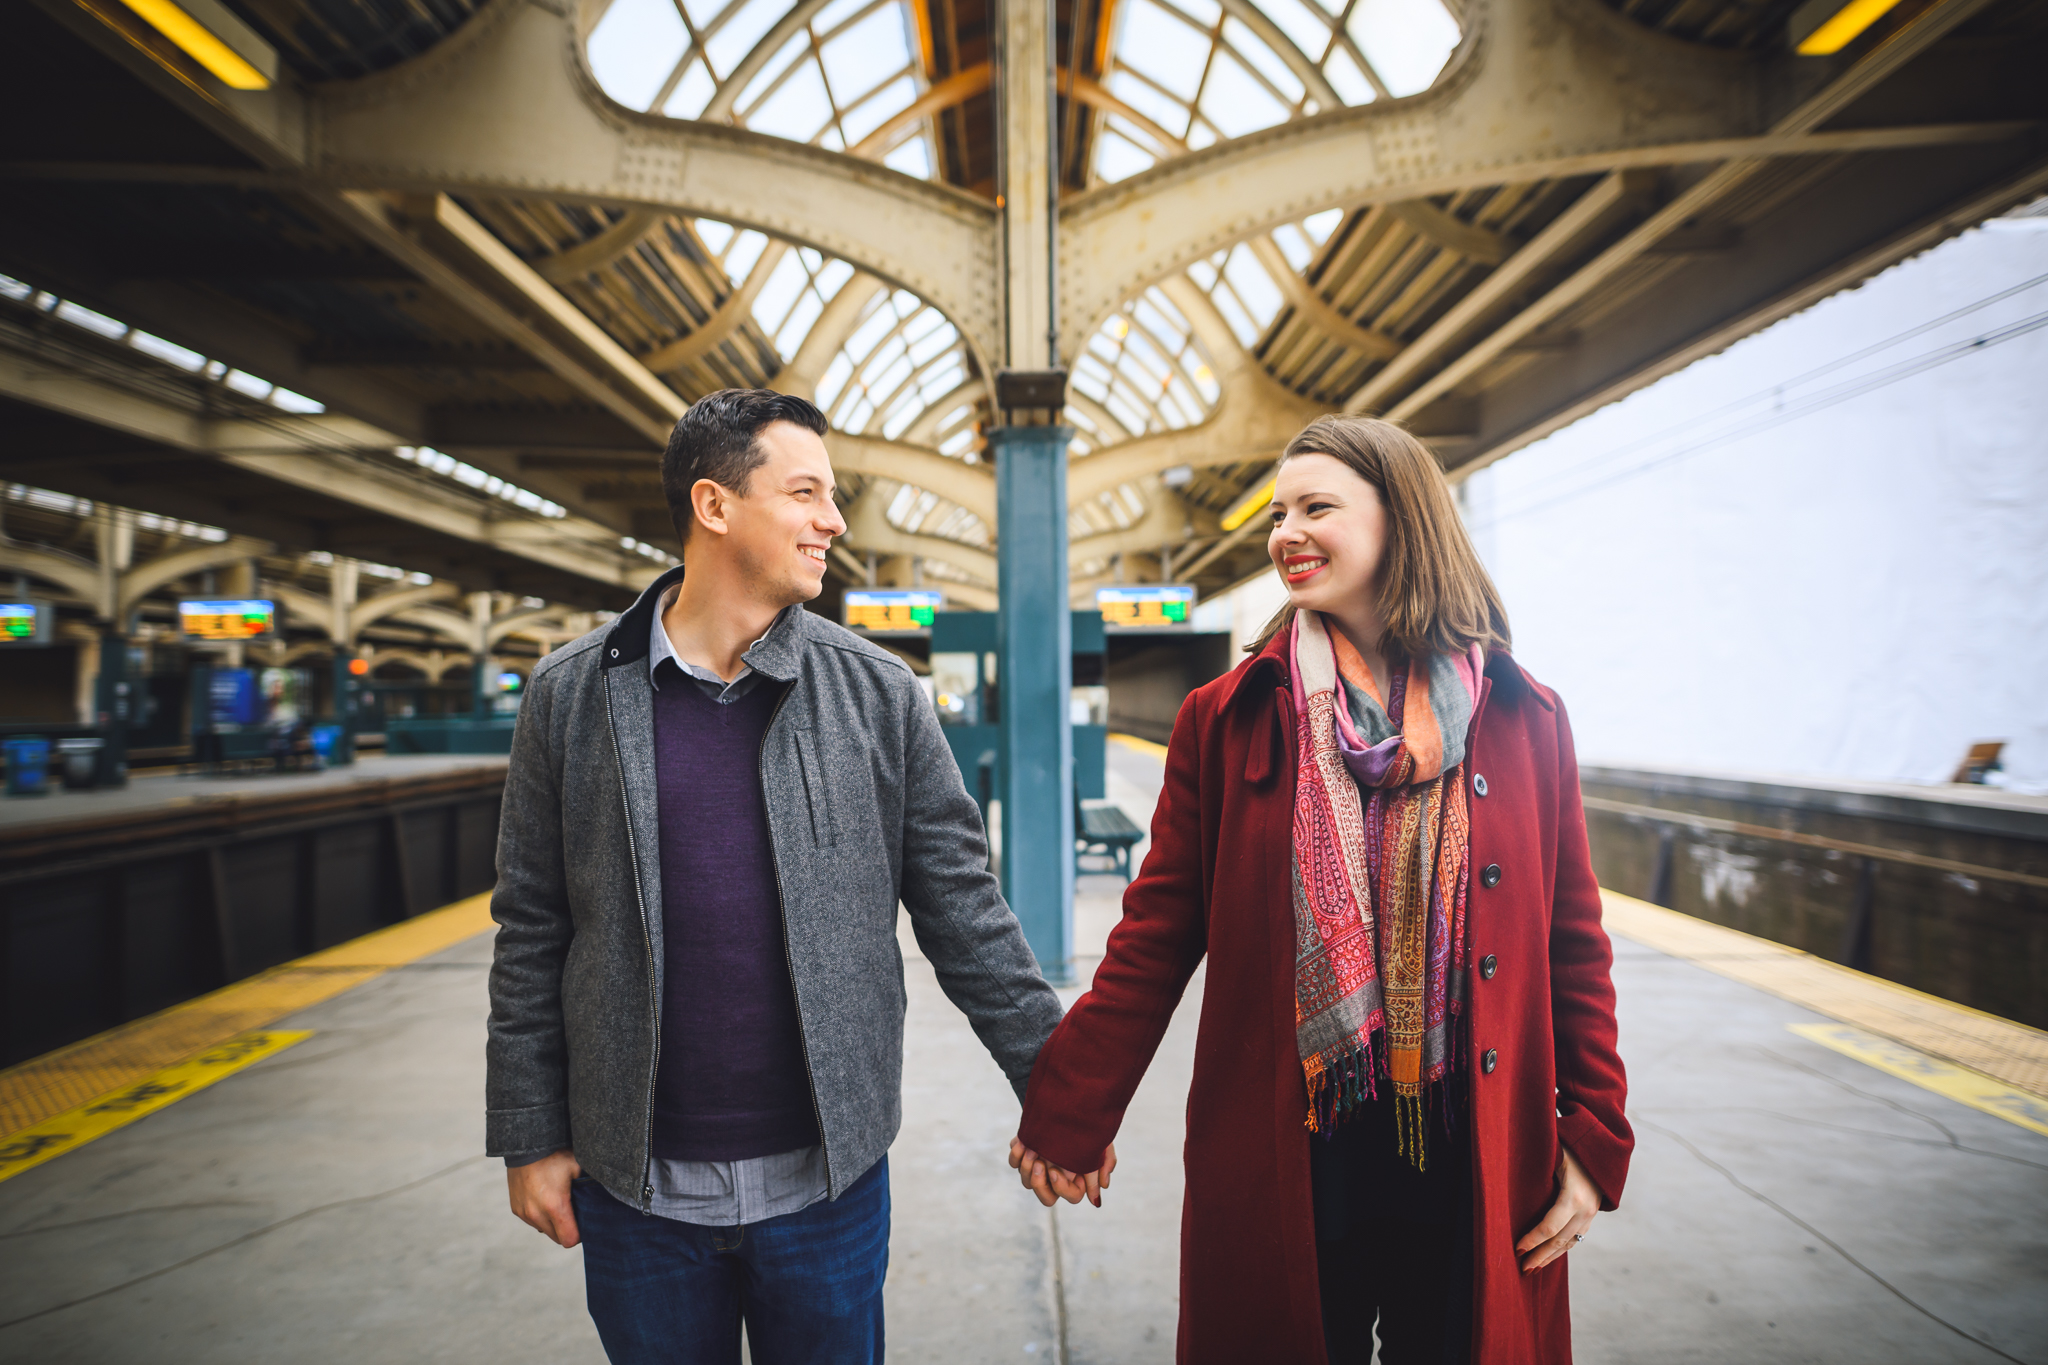 Christine-Brendan-30th-Street-Station-Engagement-Session-0004.jpg